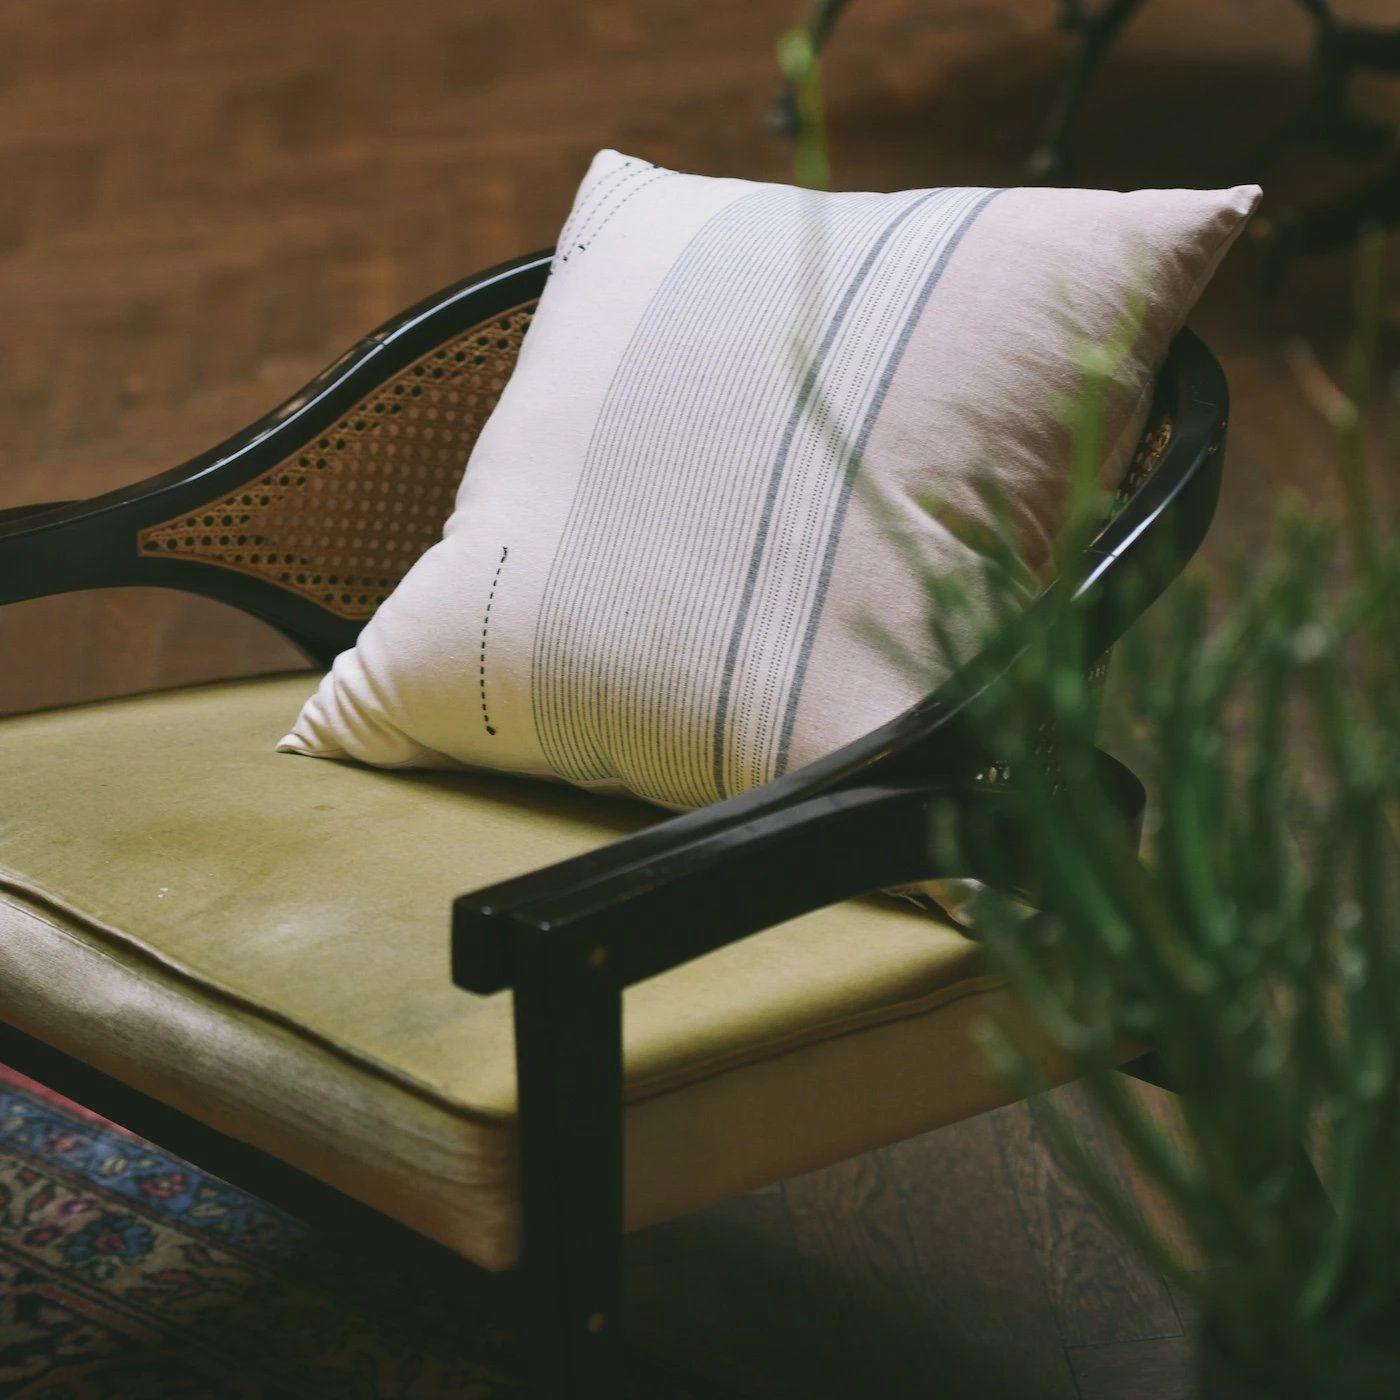 Susan B Throw Pillow In 2021 Pillows Patterned Sheet Set Throw Pillows